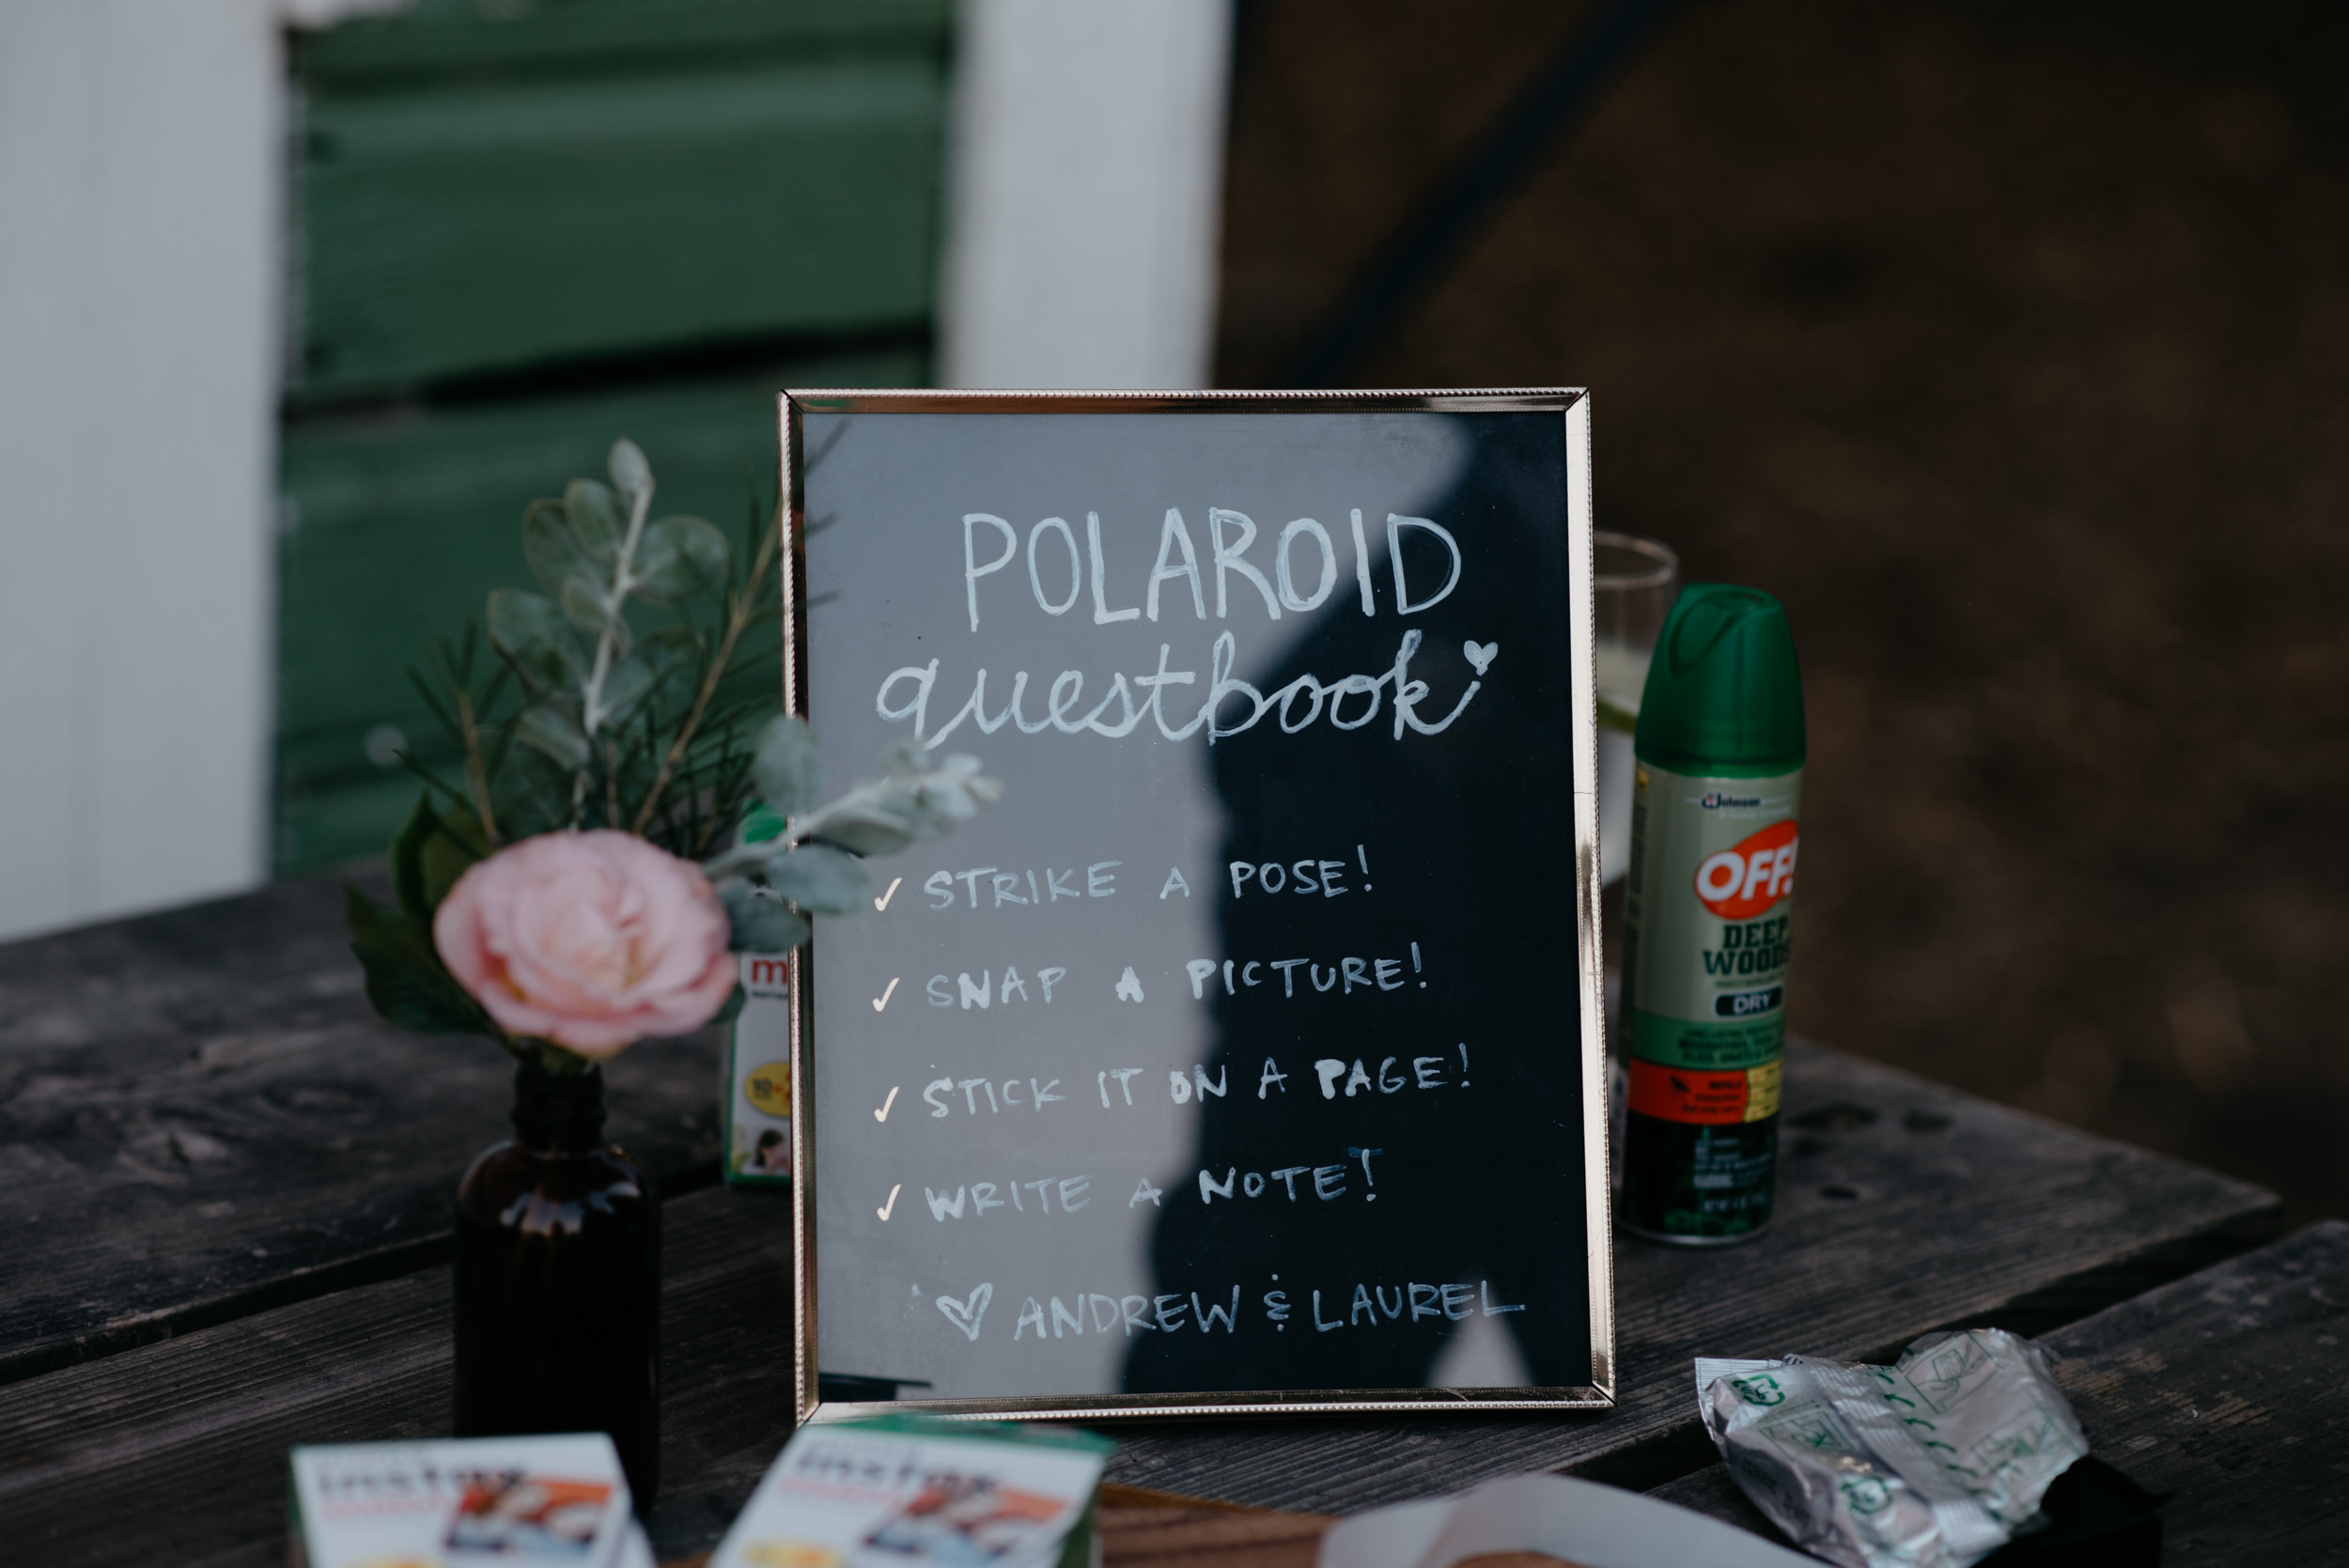 Polaroid guest book. Boulder, Colorado wedding at Three Leaf Farm. Denver wedding photographer. Colorado mountain weddings and elopements. Colorado affordable wedding photographer.